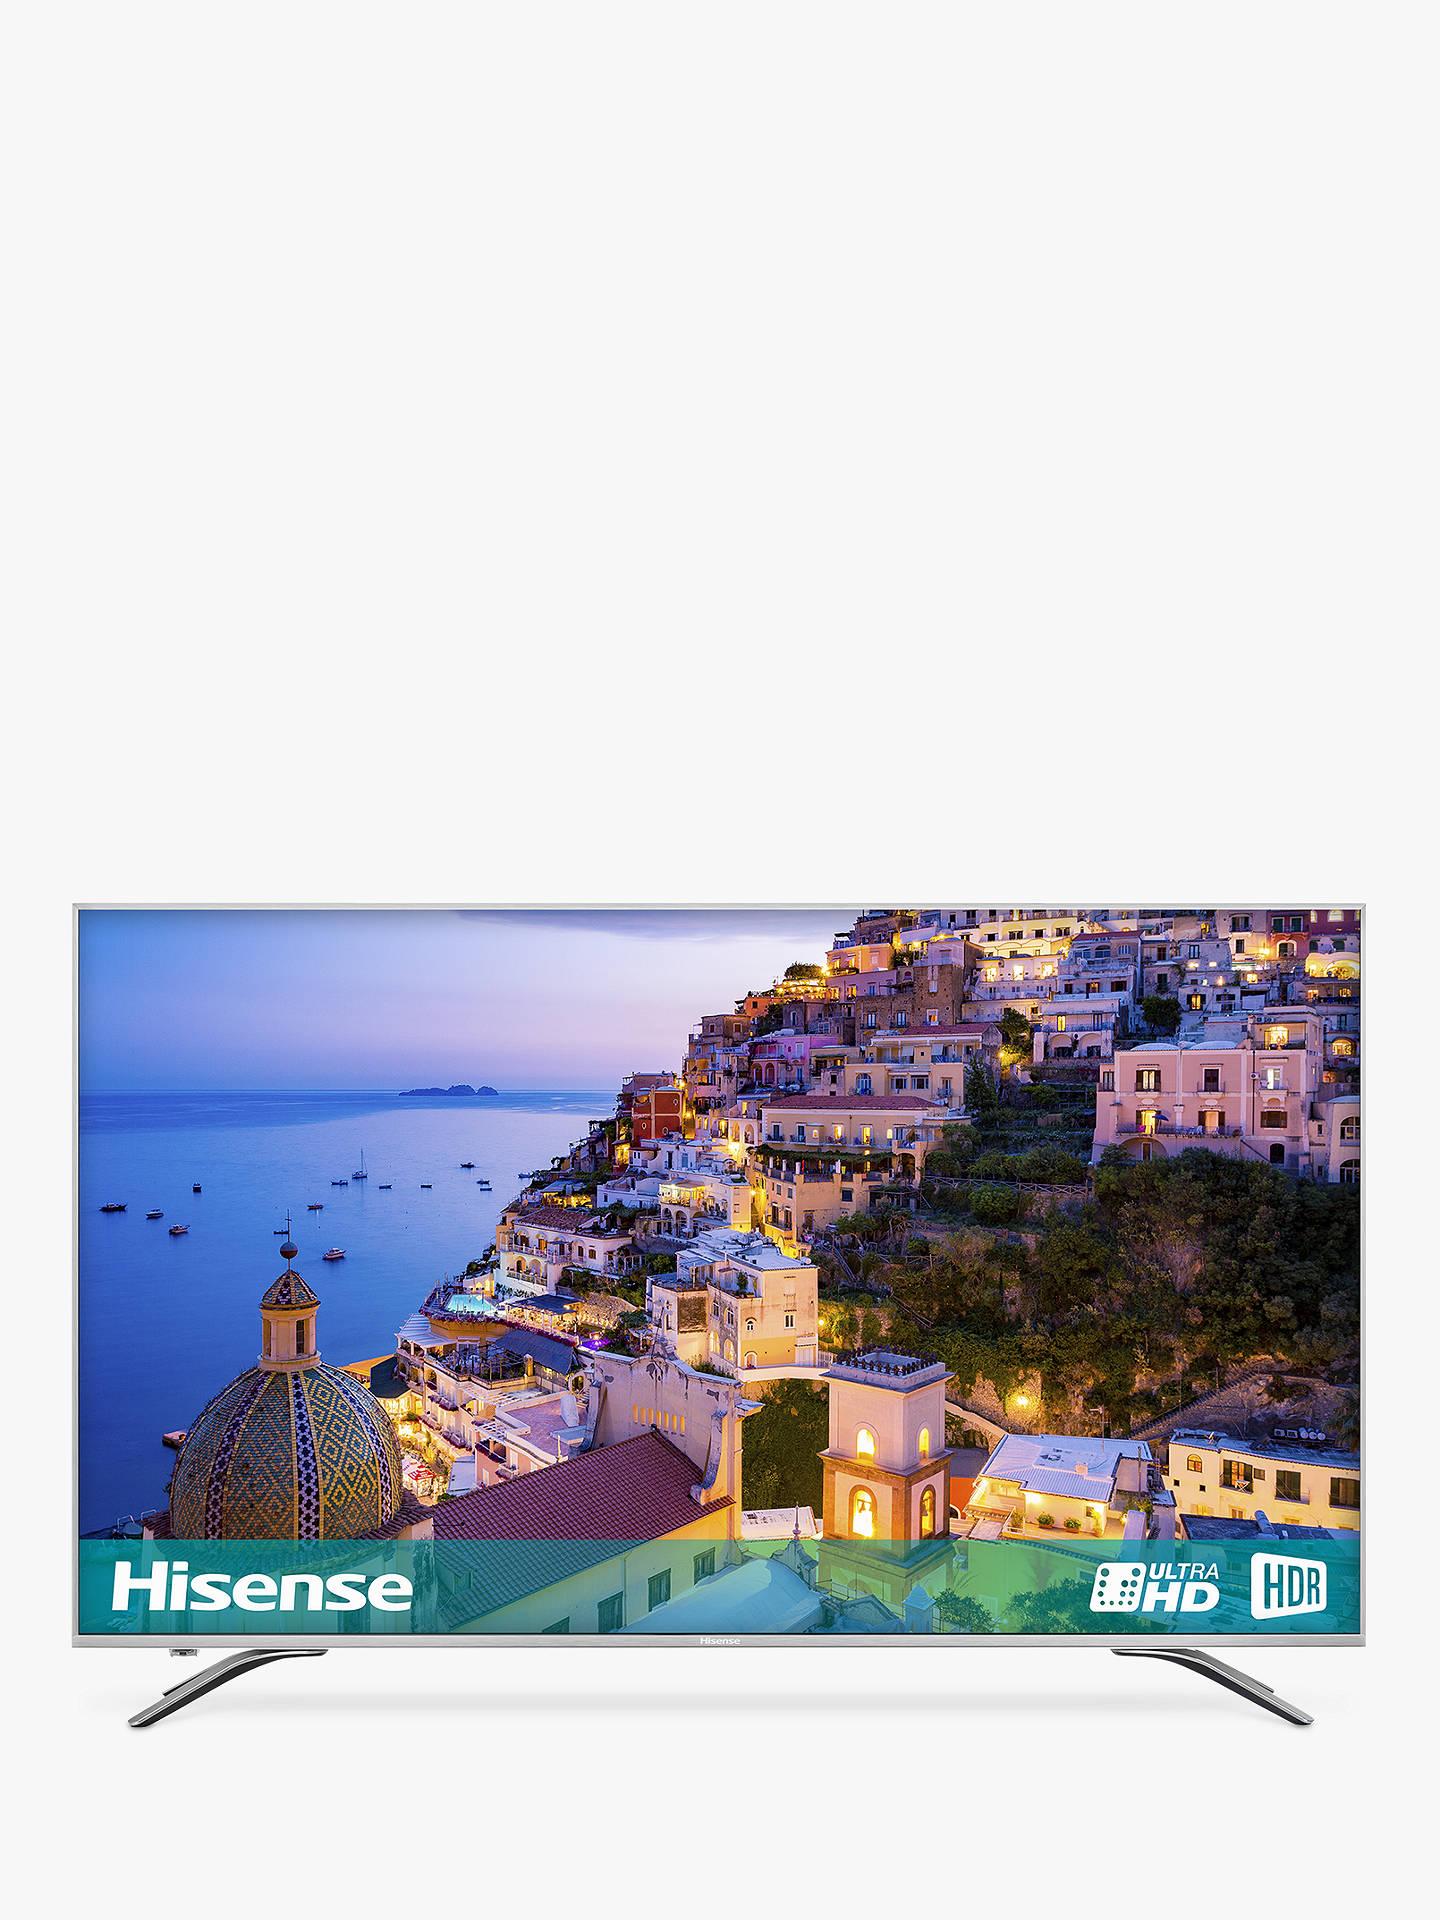 download apps on my hisense smart tv